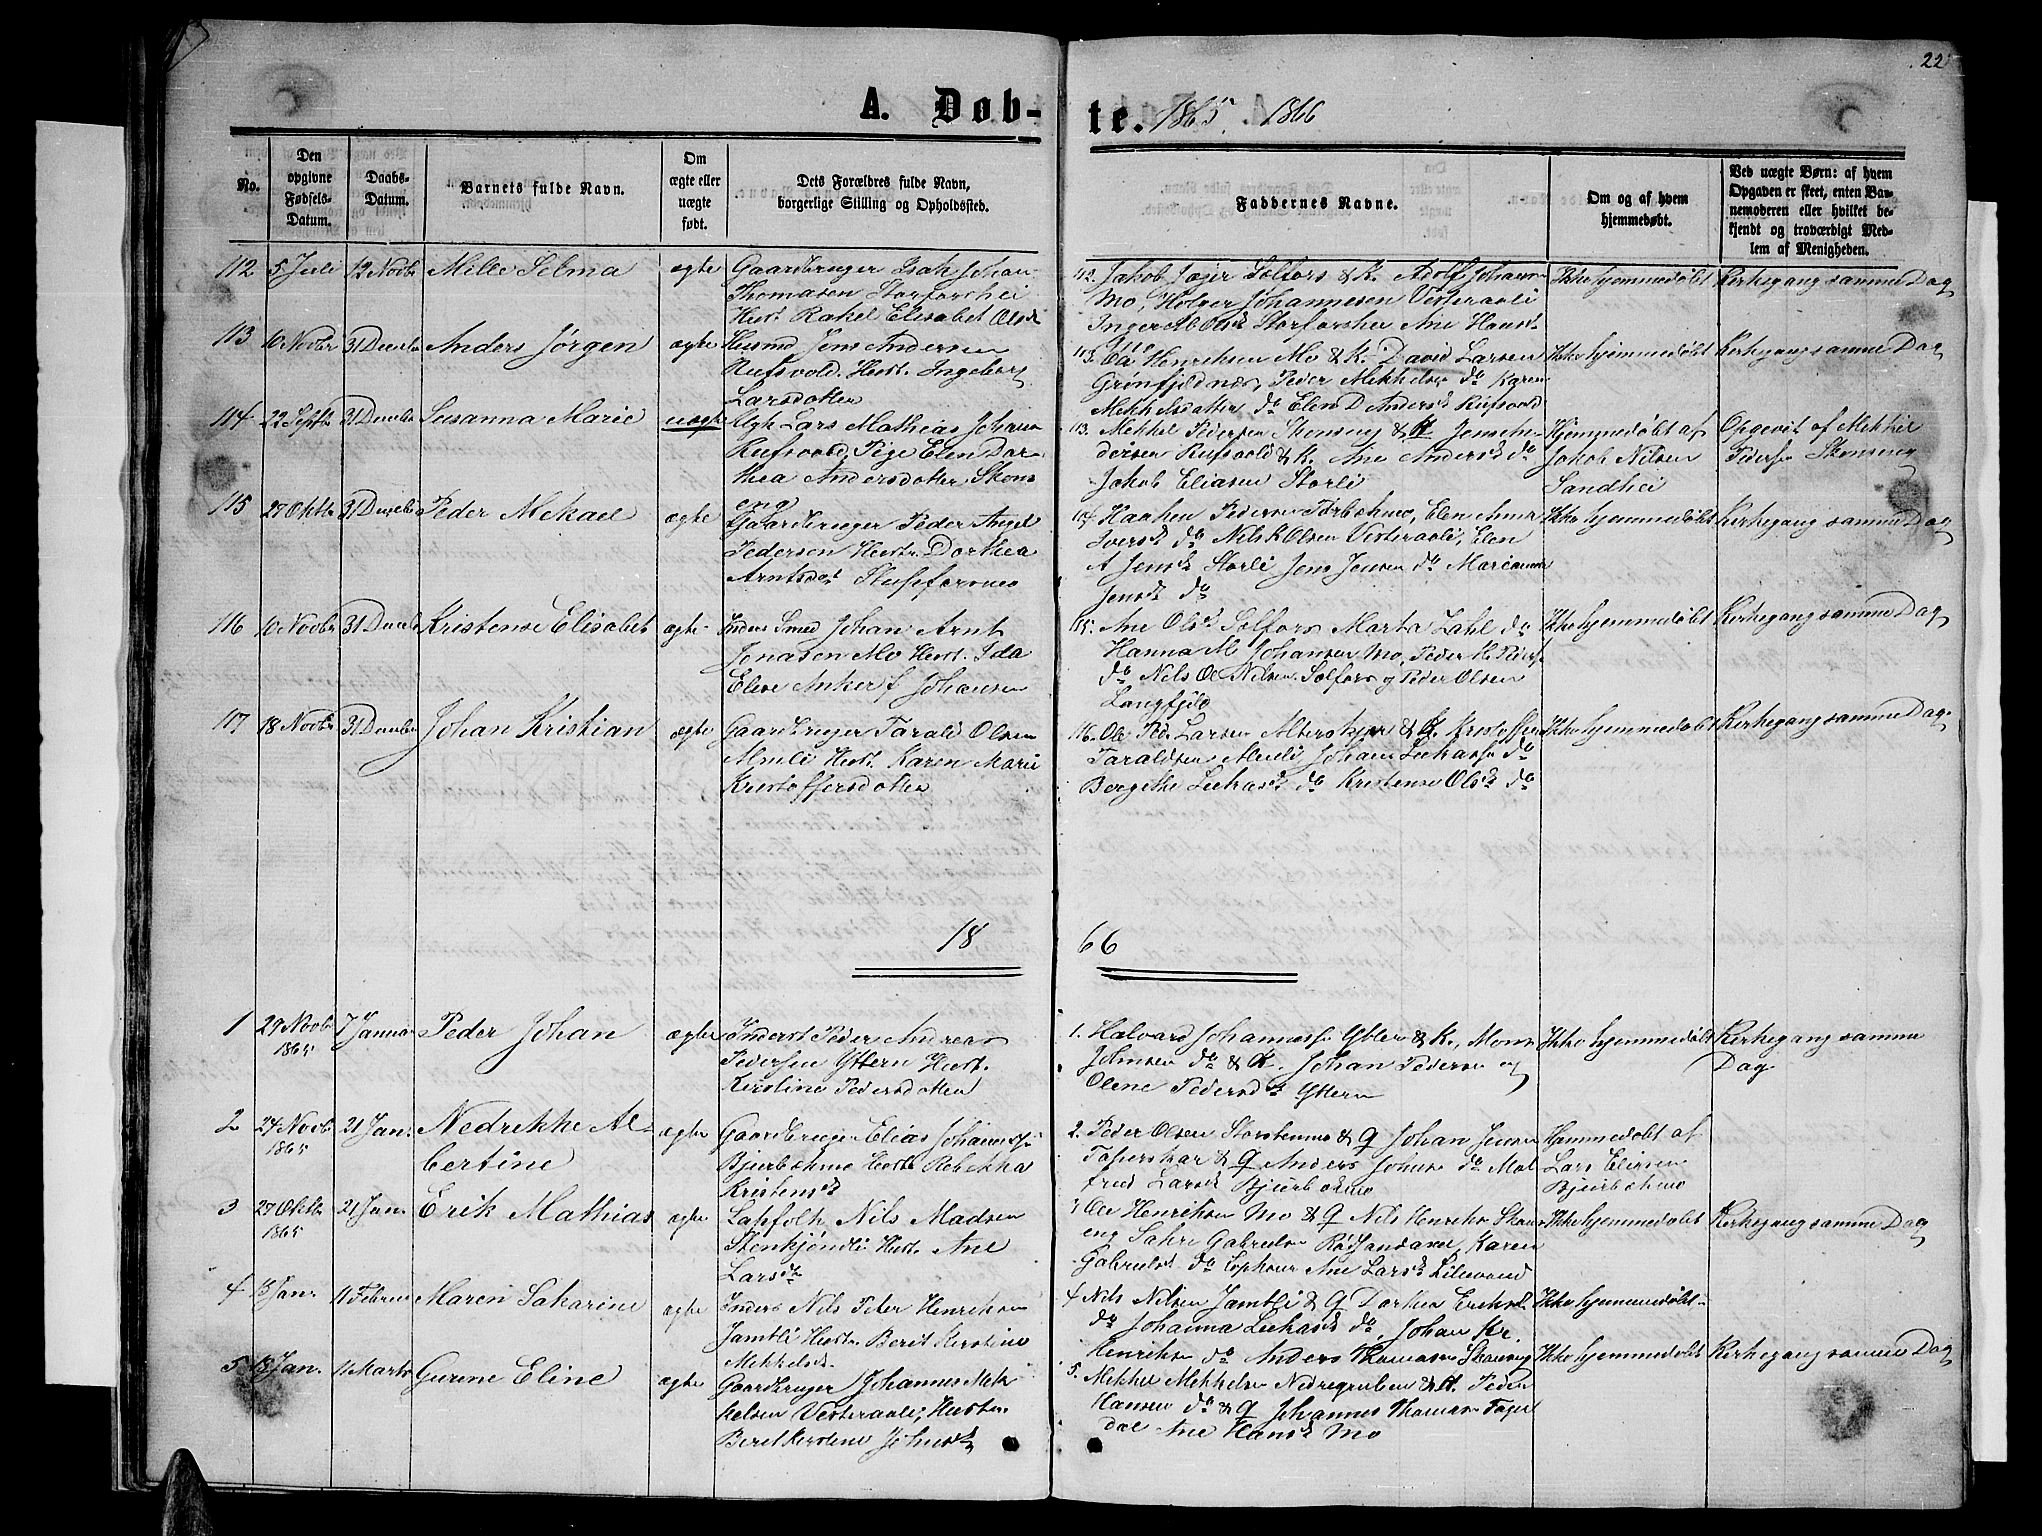 SAT, Ministerialprotokoller, klokkerbøker og fødselsregistre - Nordland, 827/L0415: Klokkerbok nr. 827C04, 1864-1886, s. 22